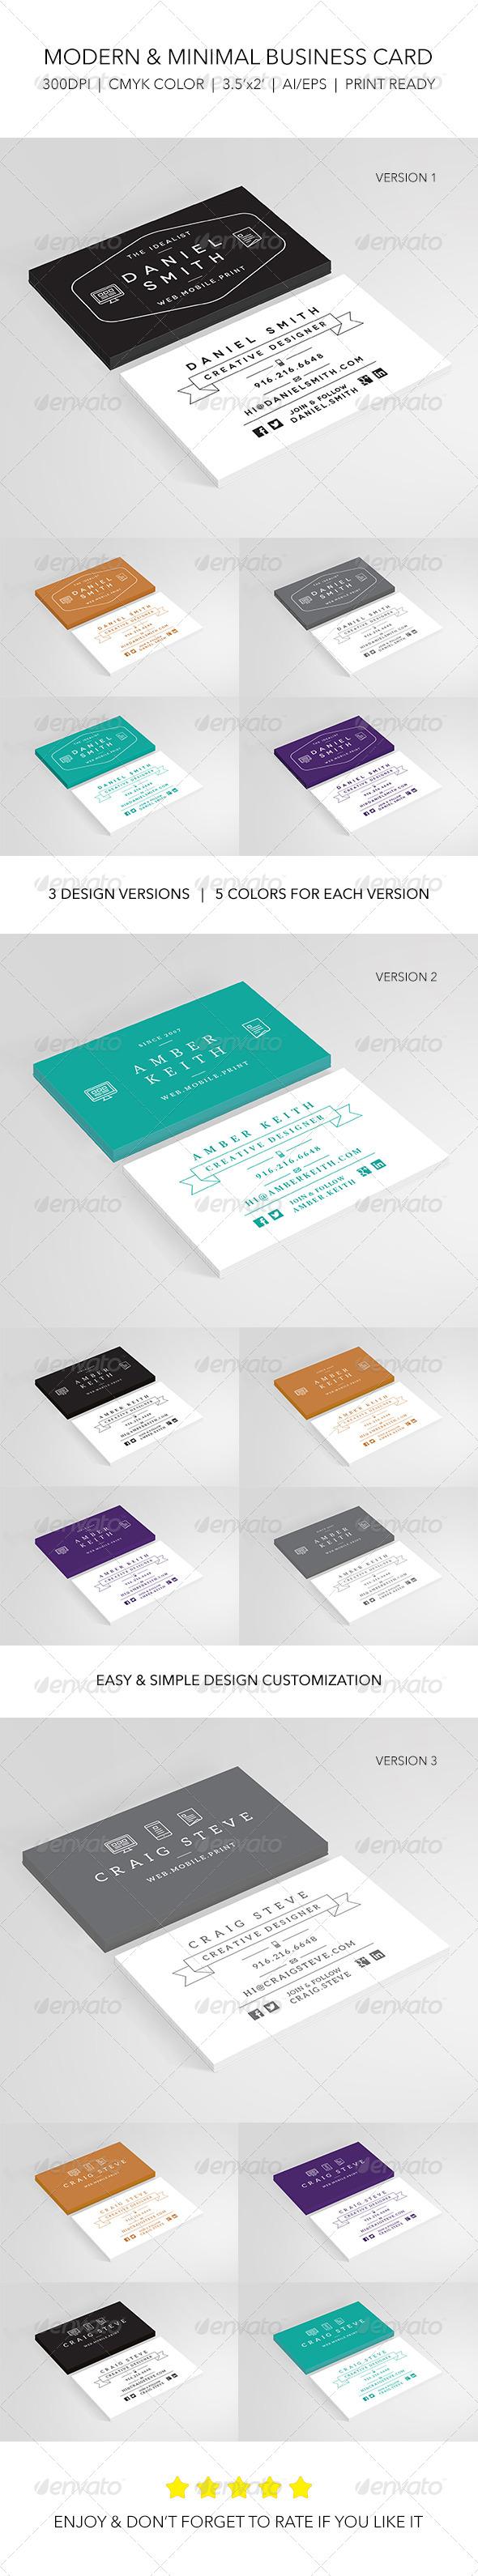 GraphicRiver Modern & Minimal Designer Business Card 6420487